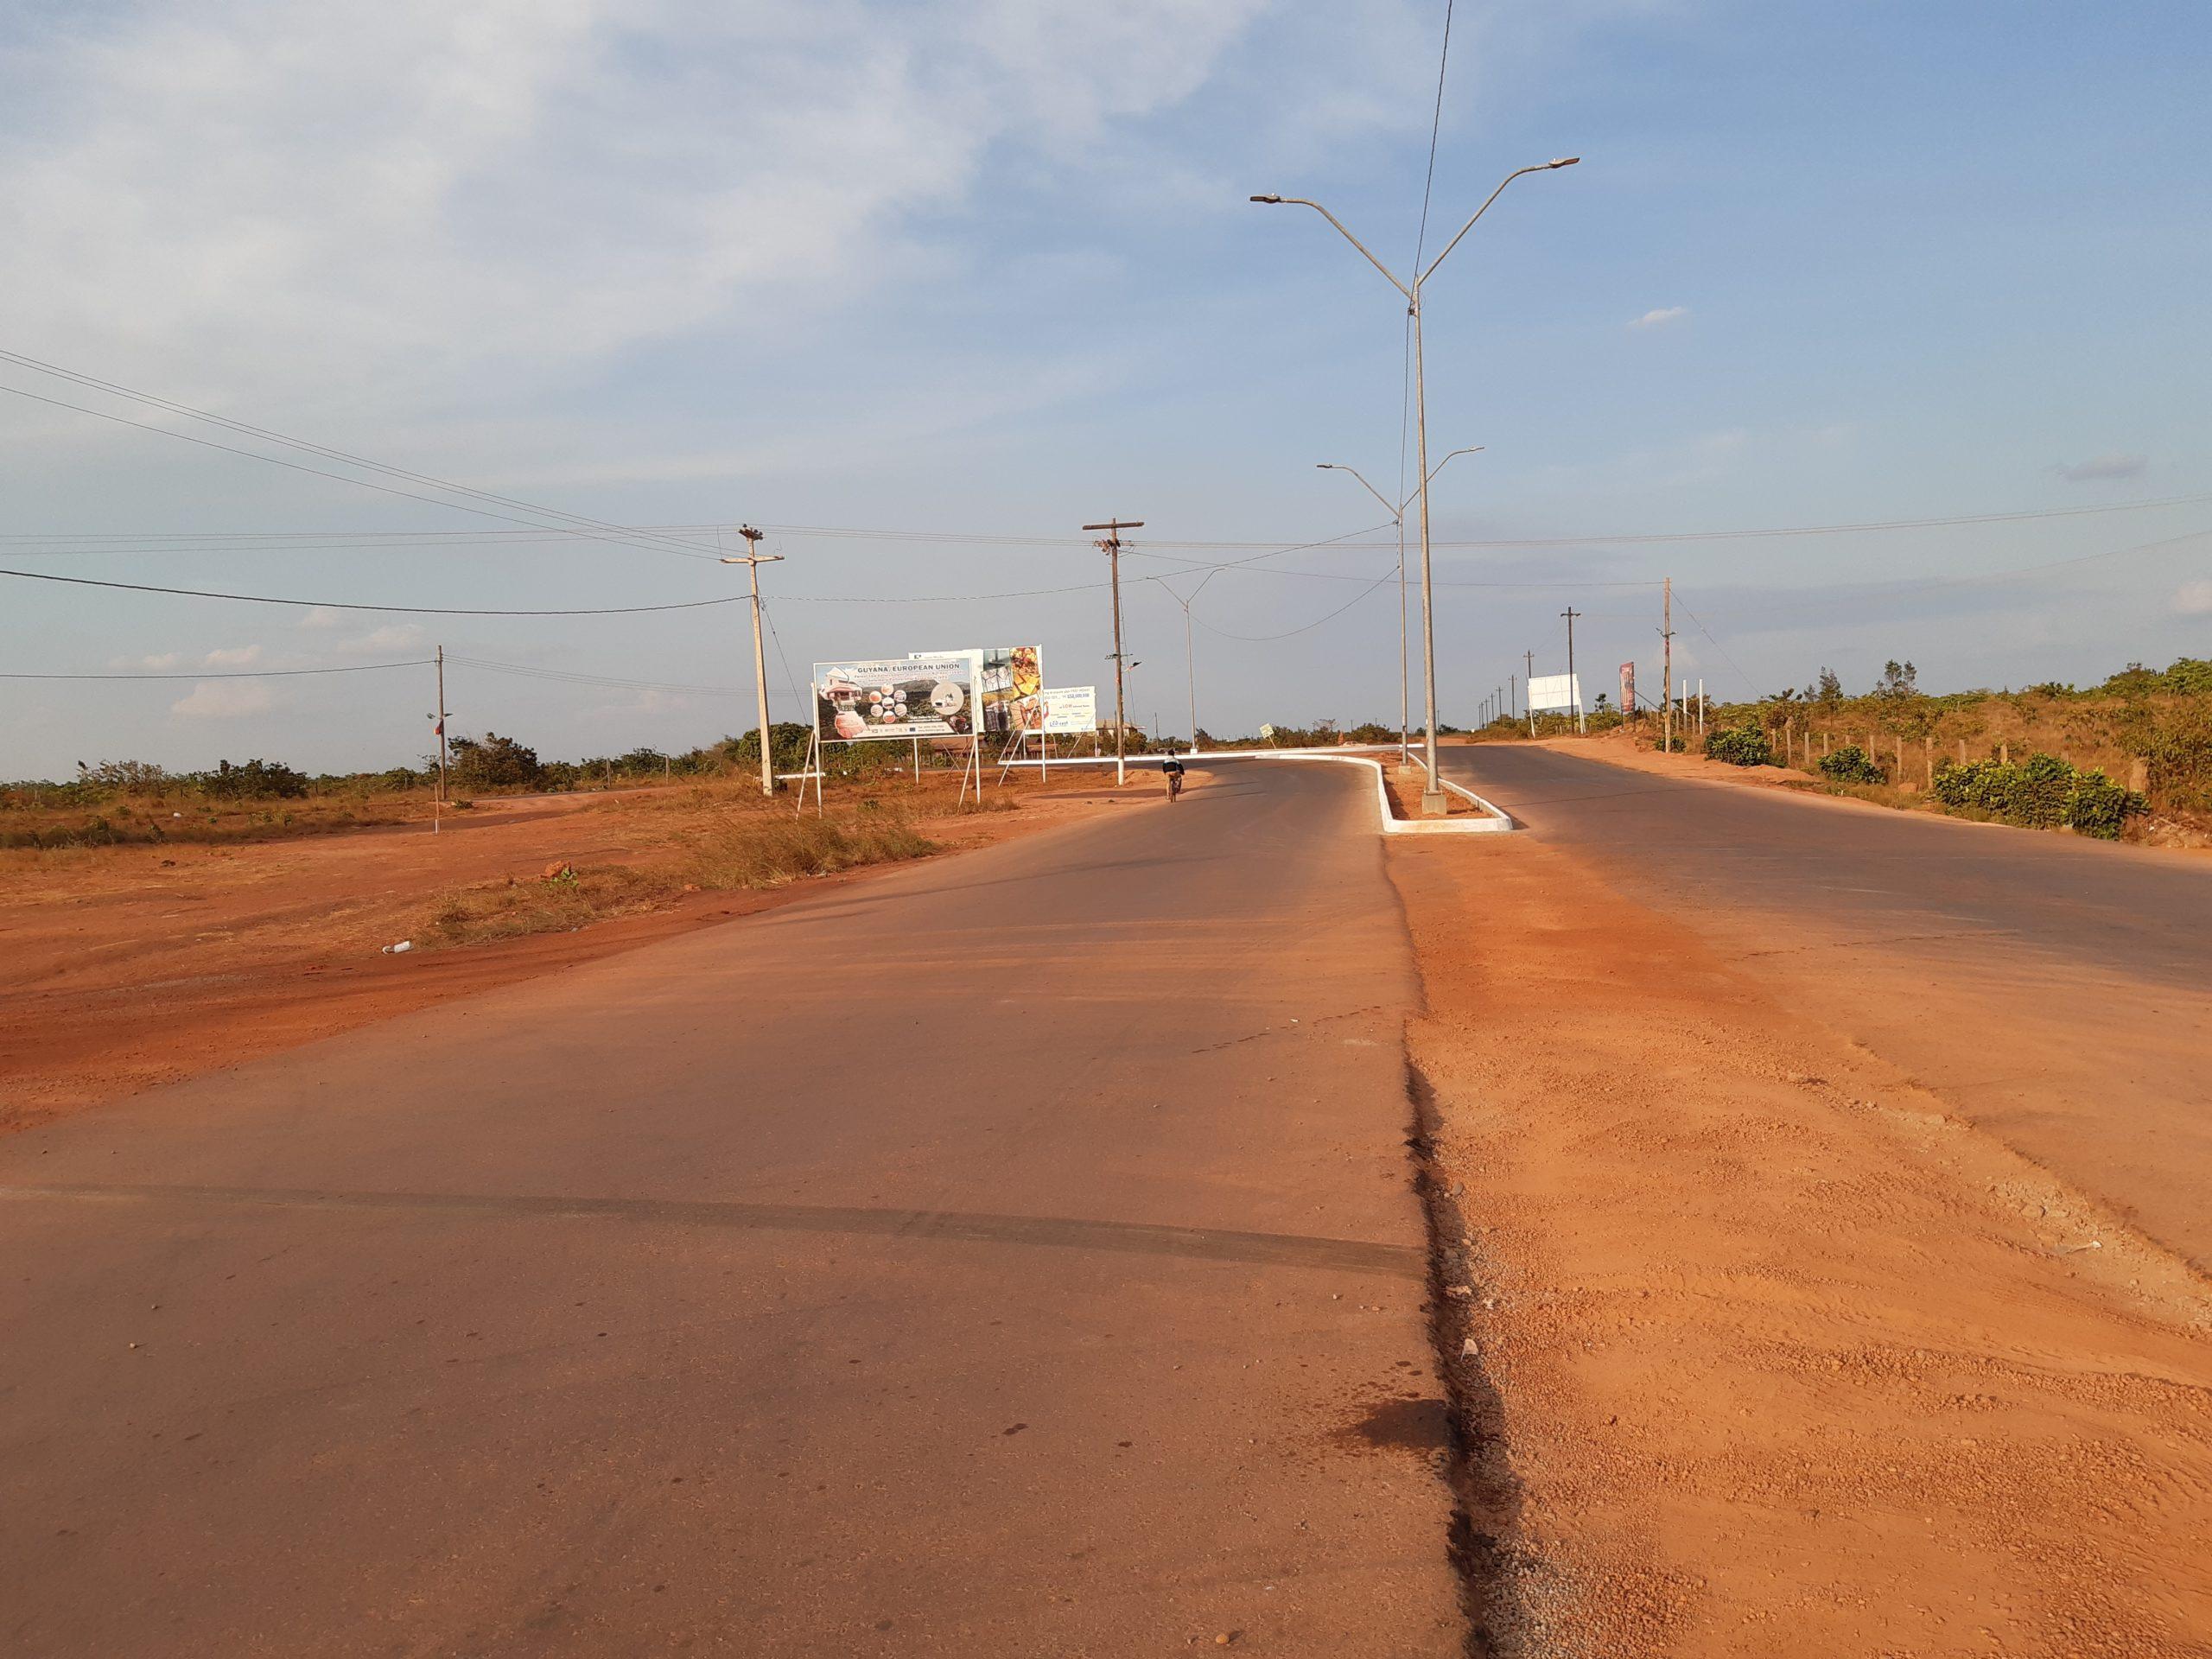 Lethem Tightens Border Security As Neighboring Bonfim Confirms 3 Cases of Coronavirus